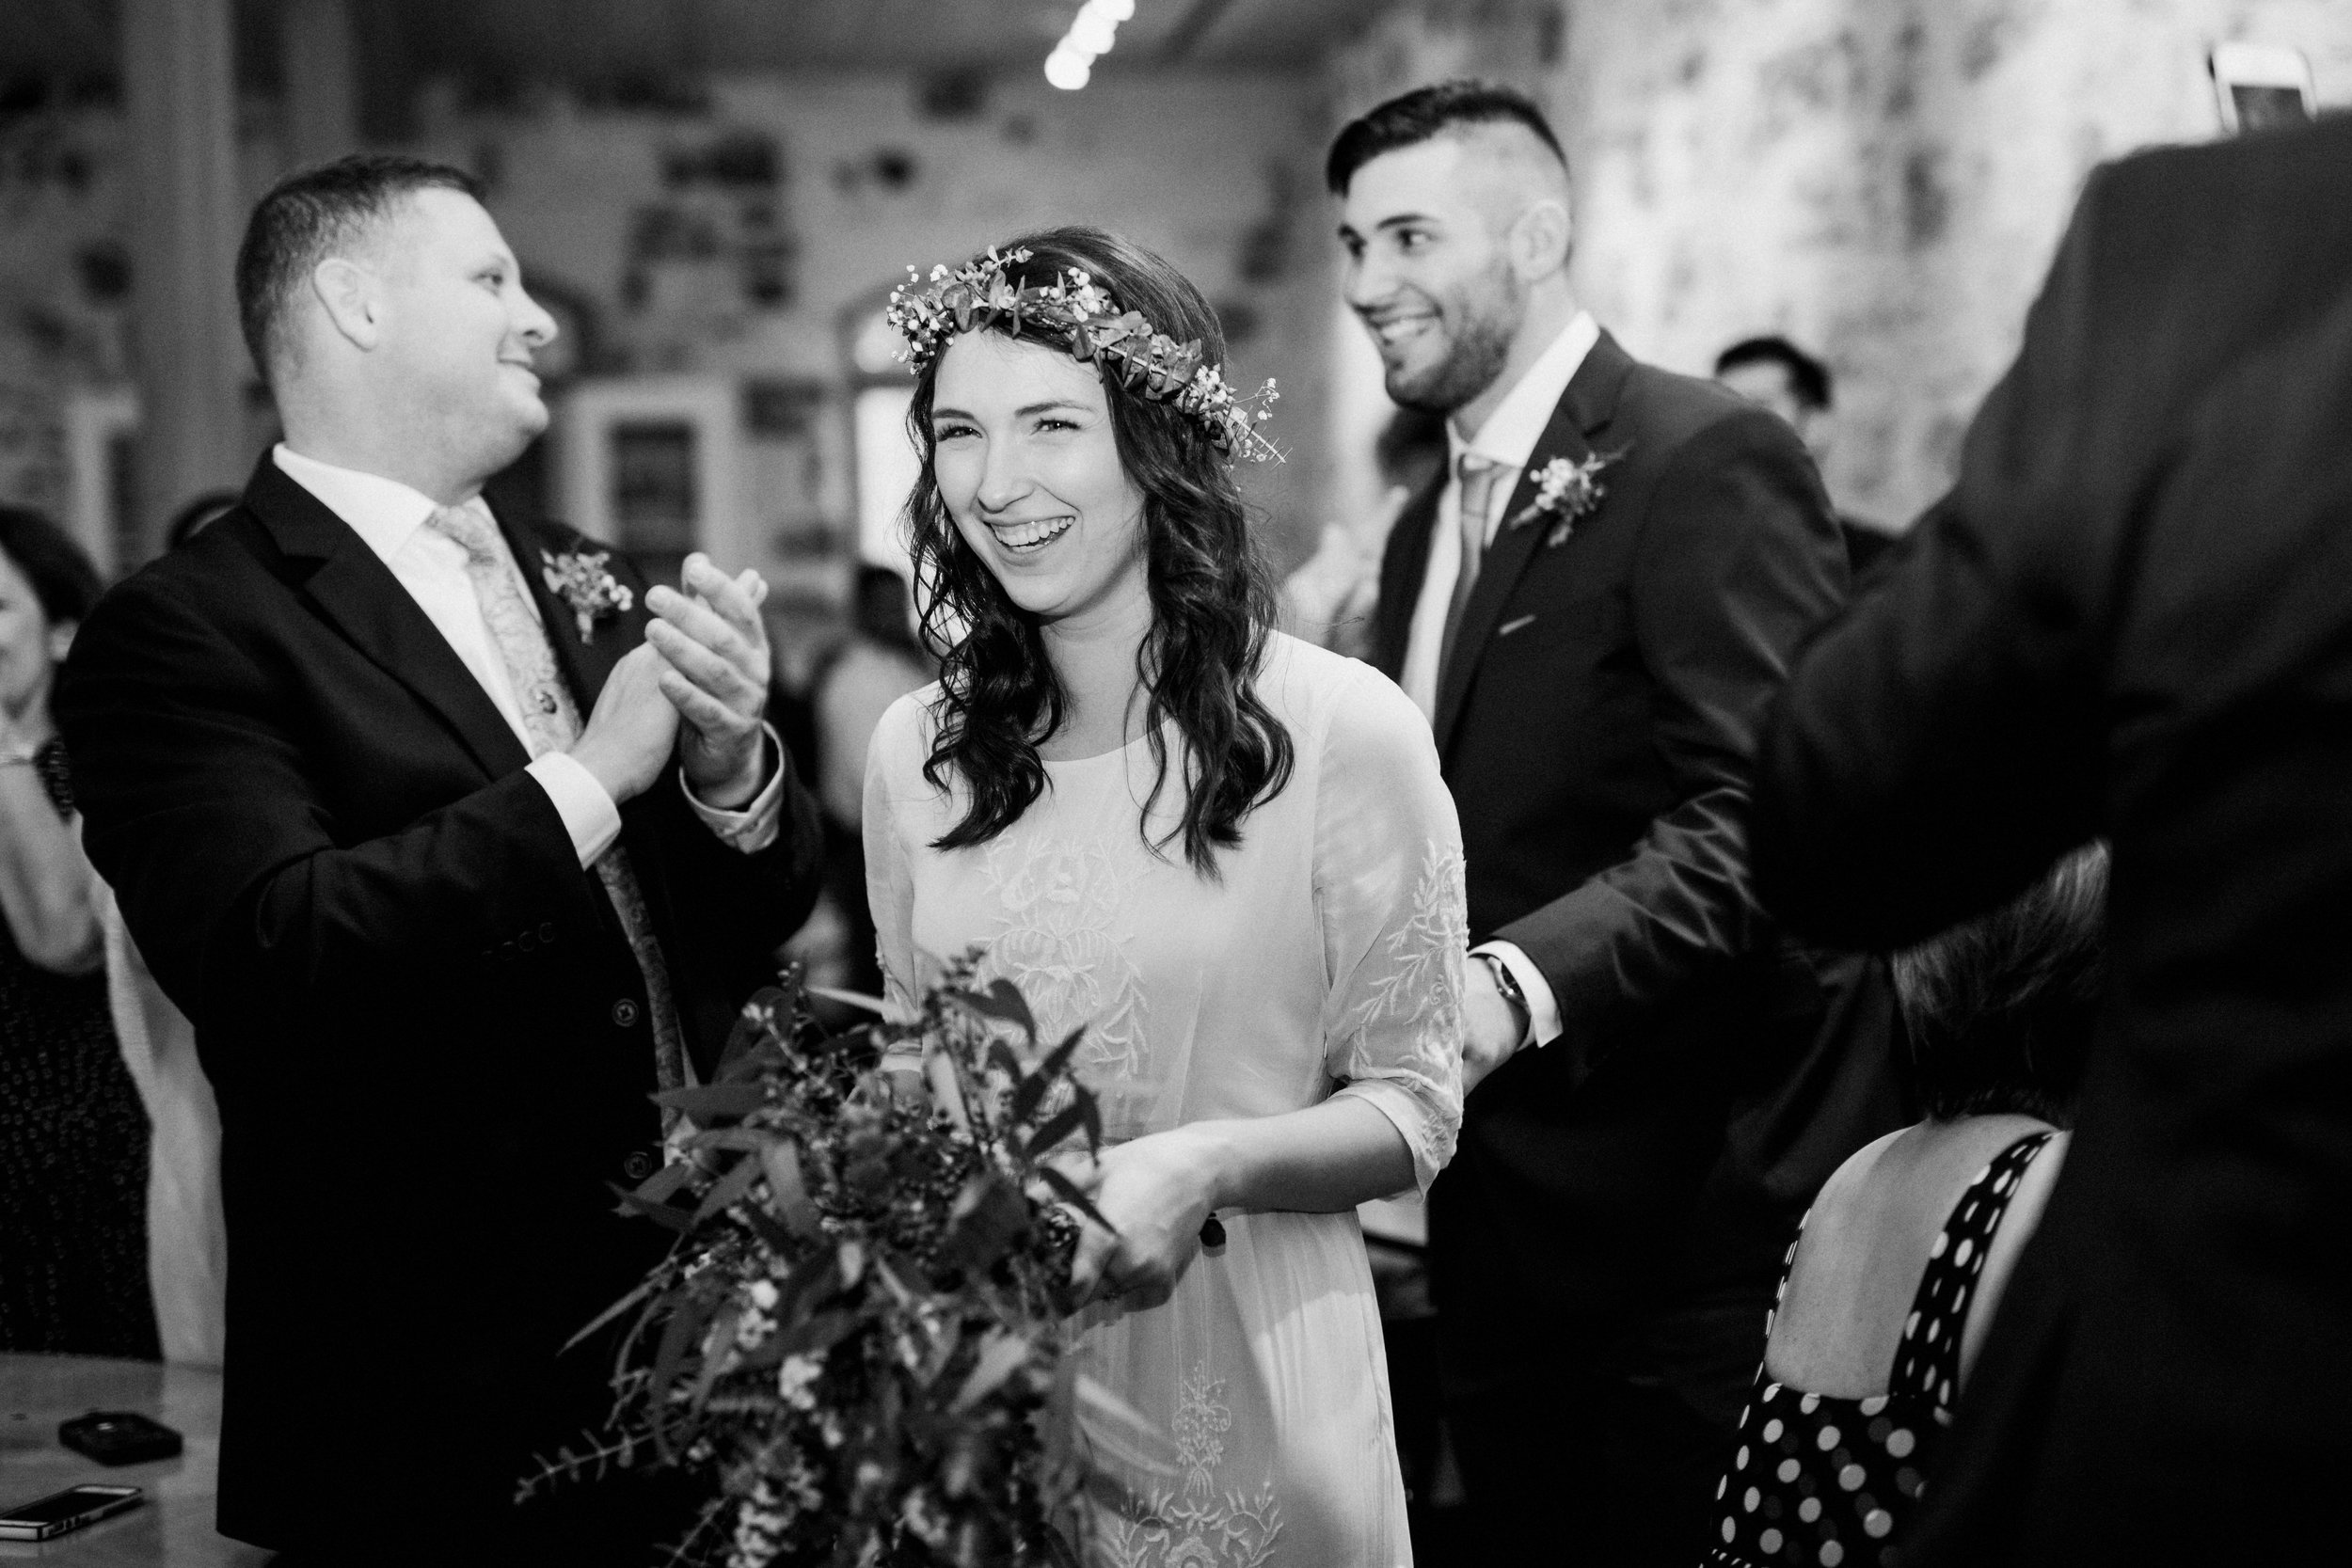 austin-wedding-photographer-56.jpg